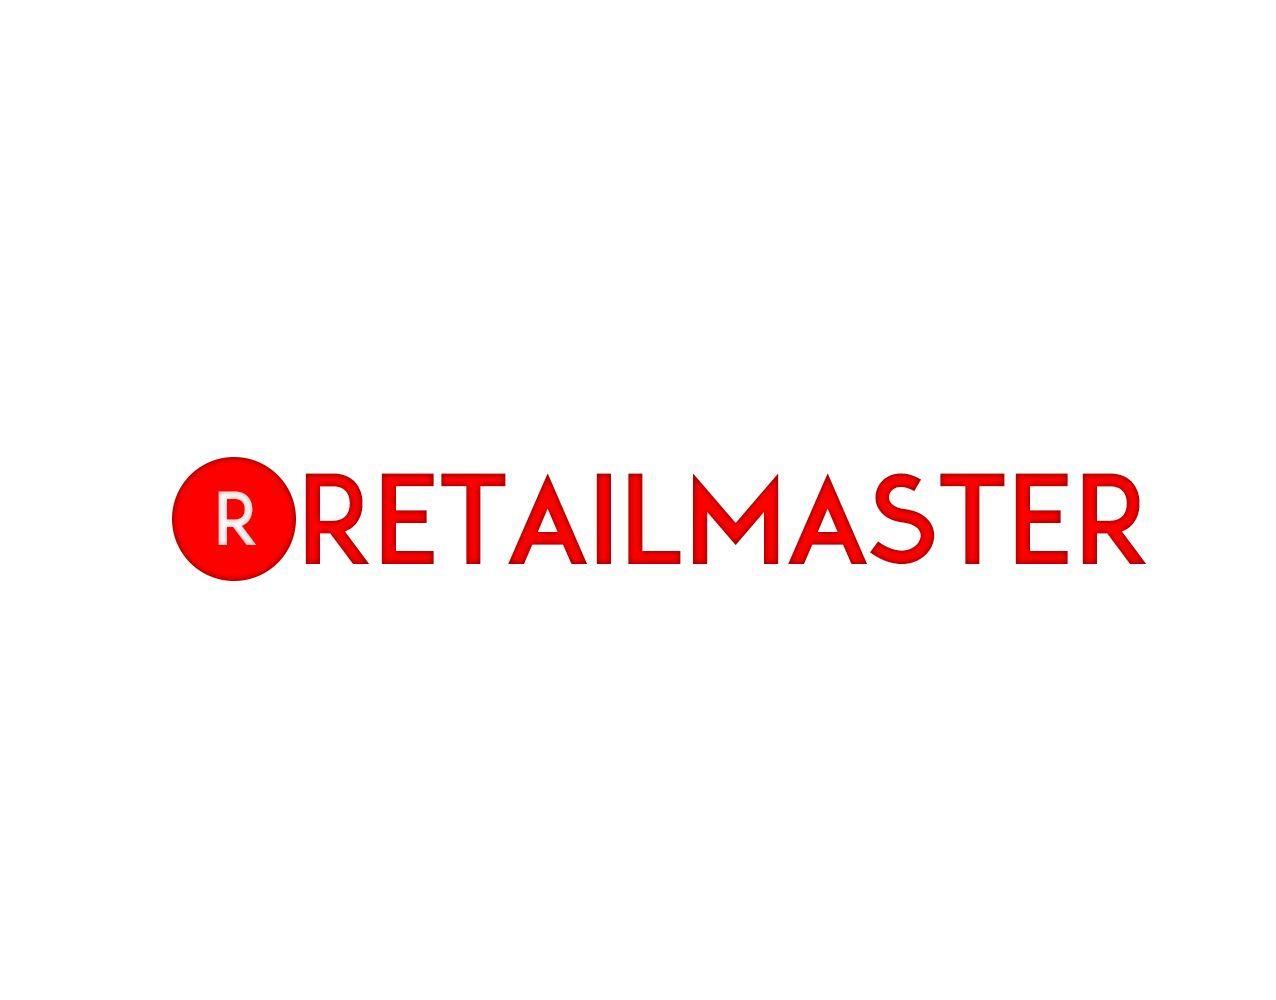 Логотип для компании Retail Master - дизайнер optimuzzy